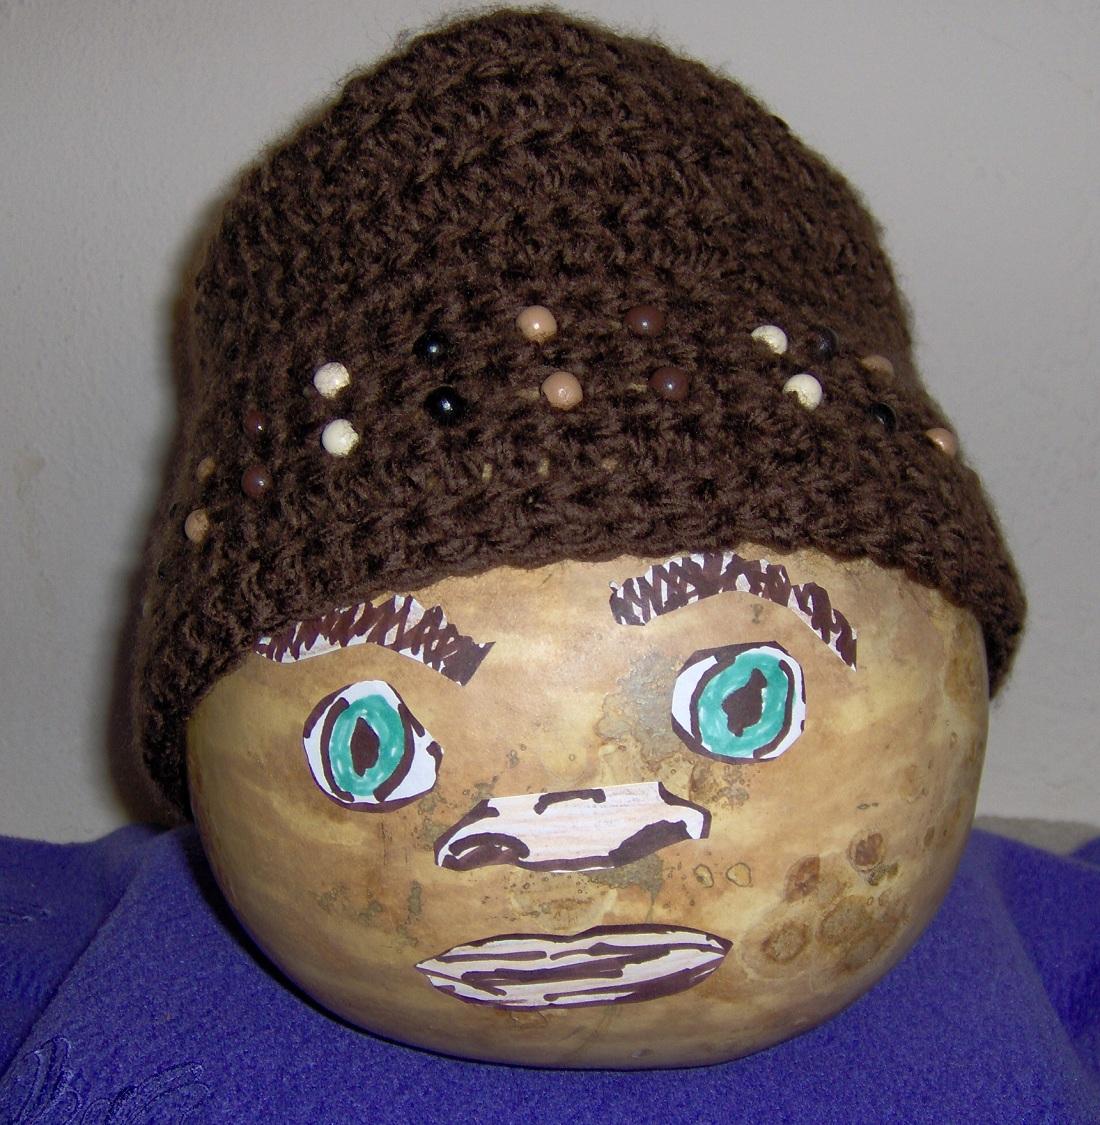 Birdies Crochet and Craft: Kool Guy Hat with Beads